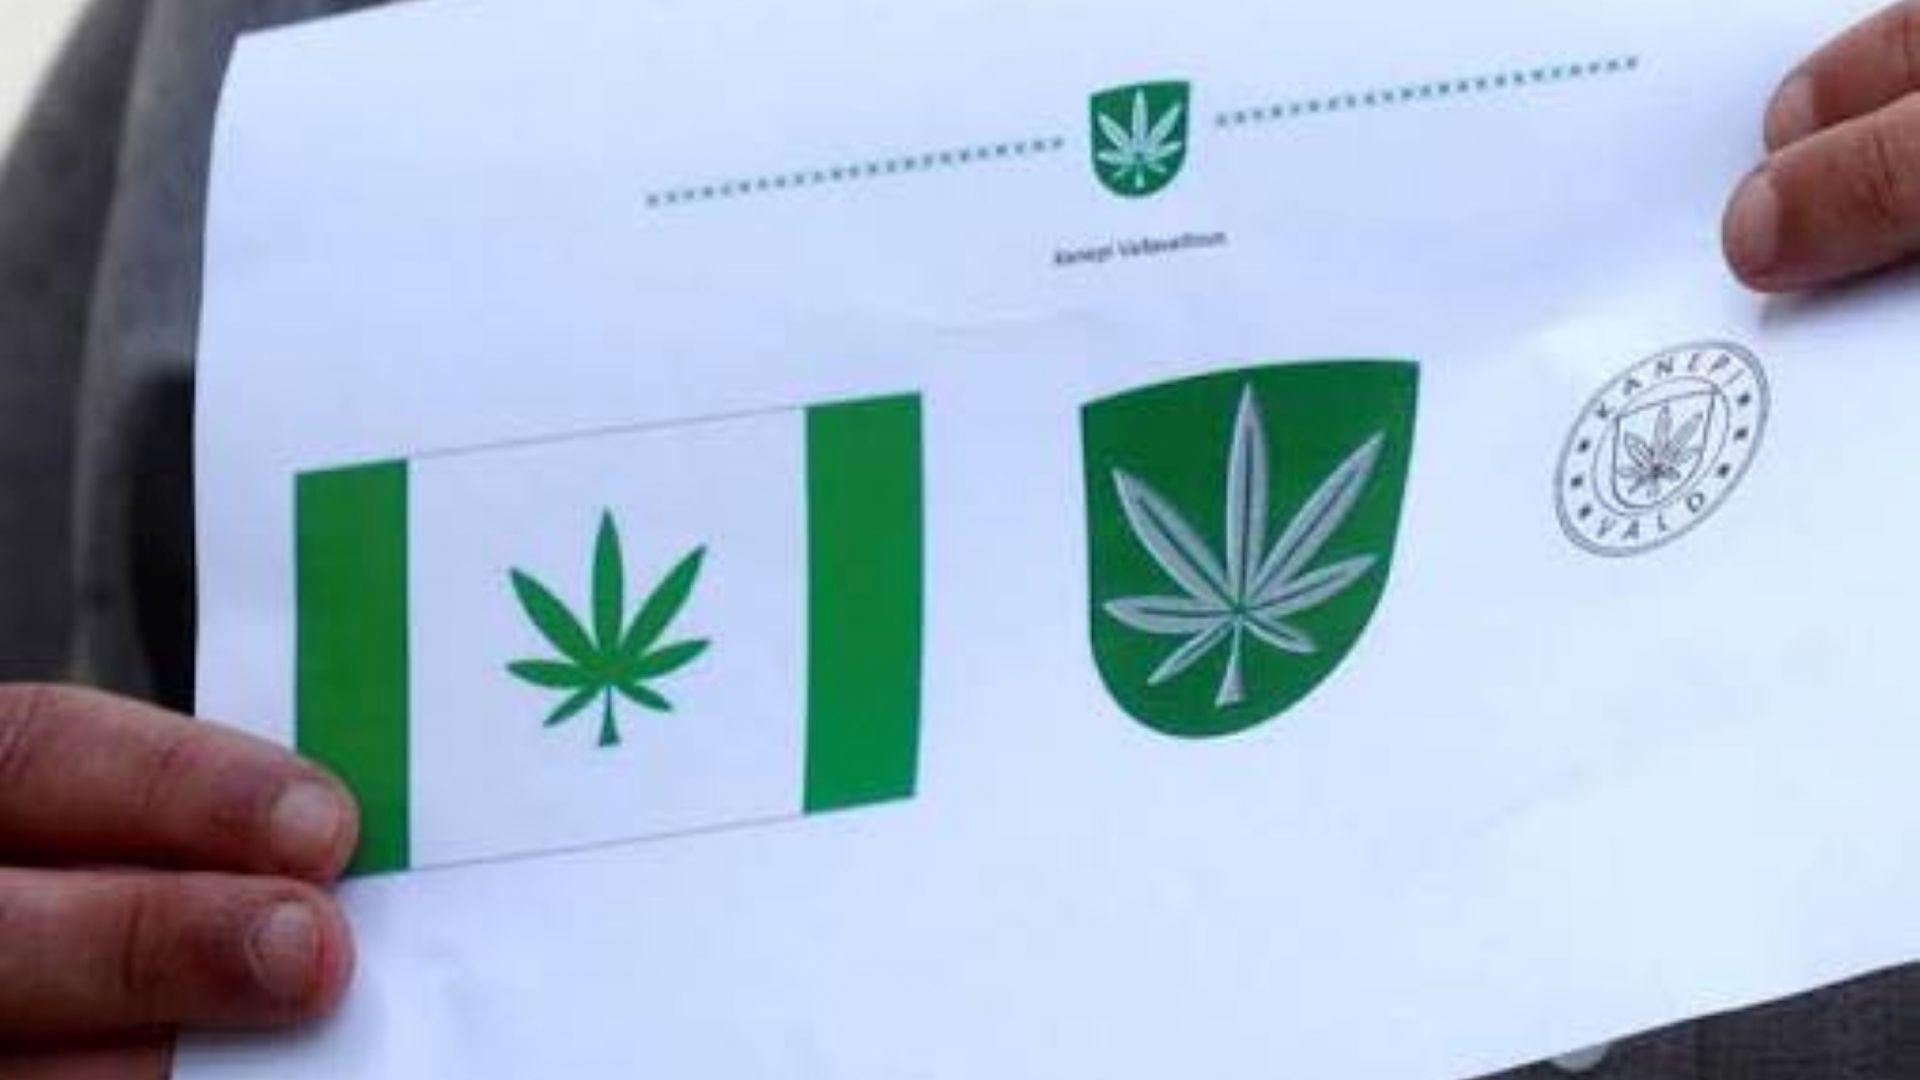 Eстонски град сложи листо марихуана на флага си